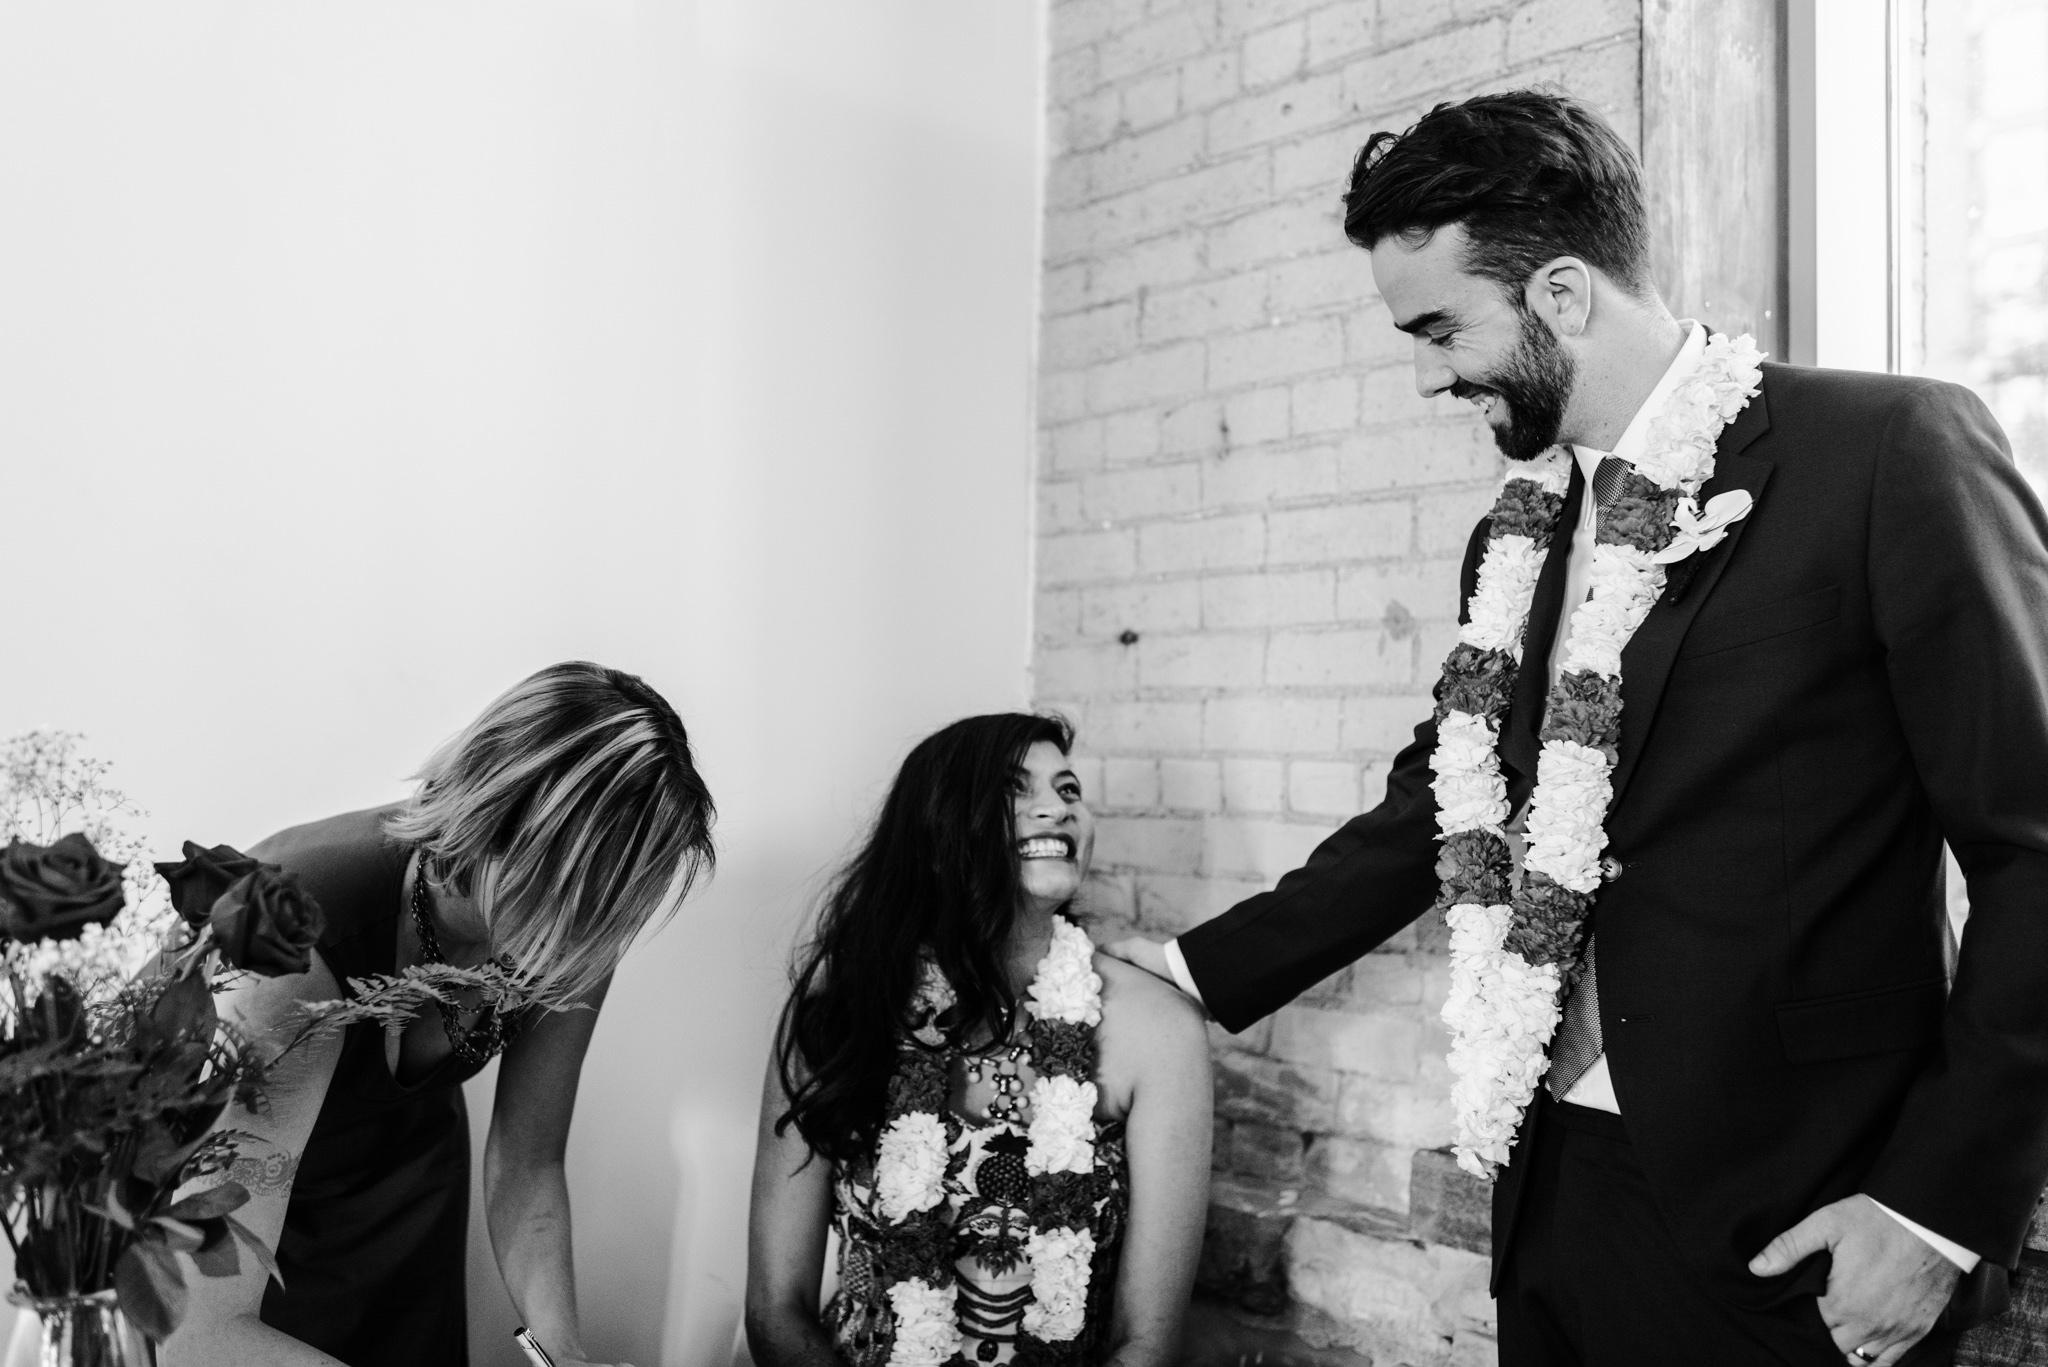 069-wedding-ceremony-reception-recessional-bride-groom-exit-photographer.jpg